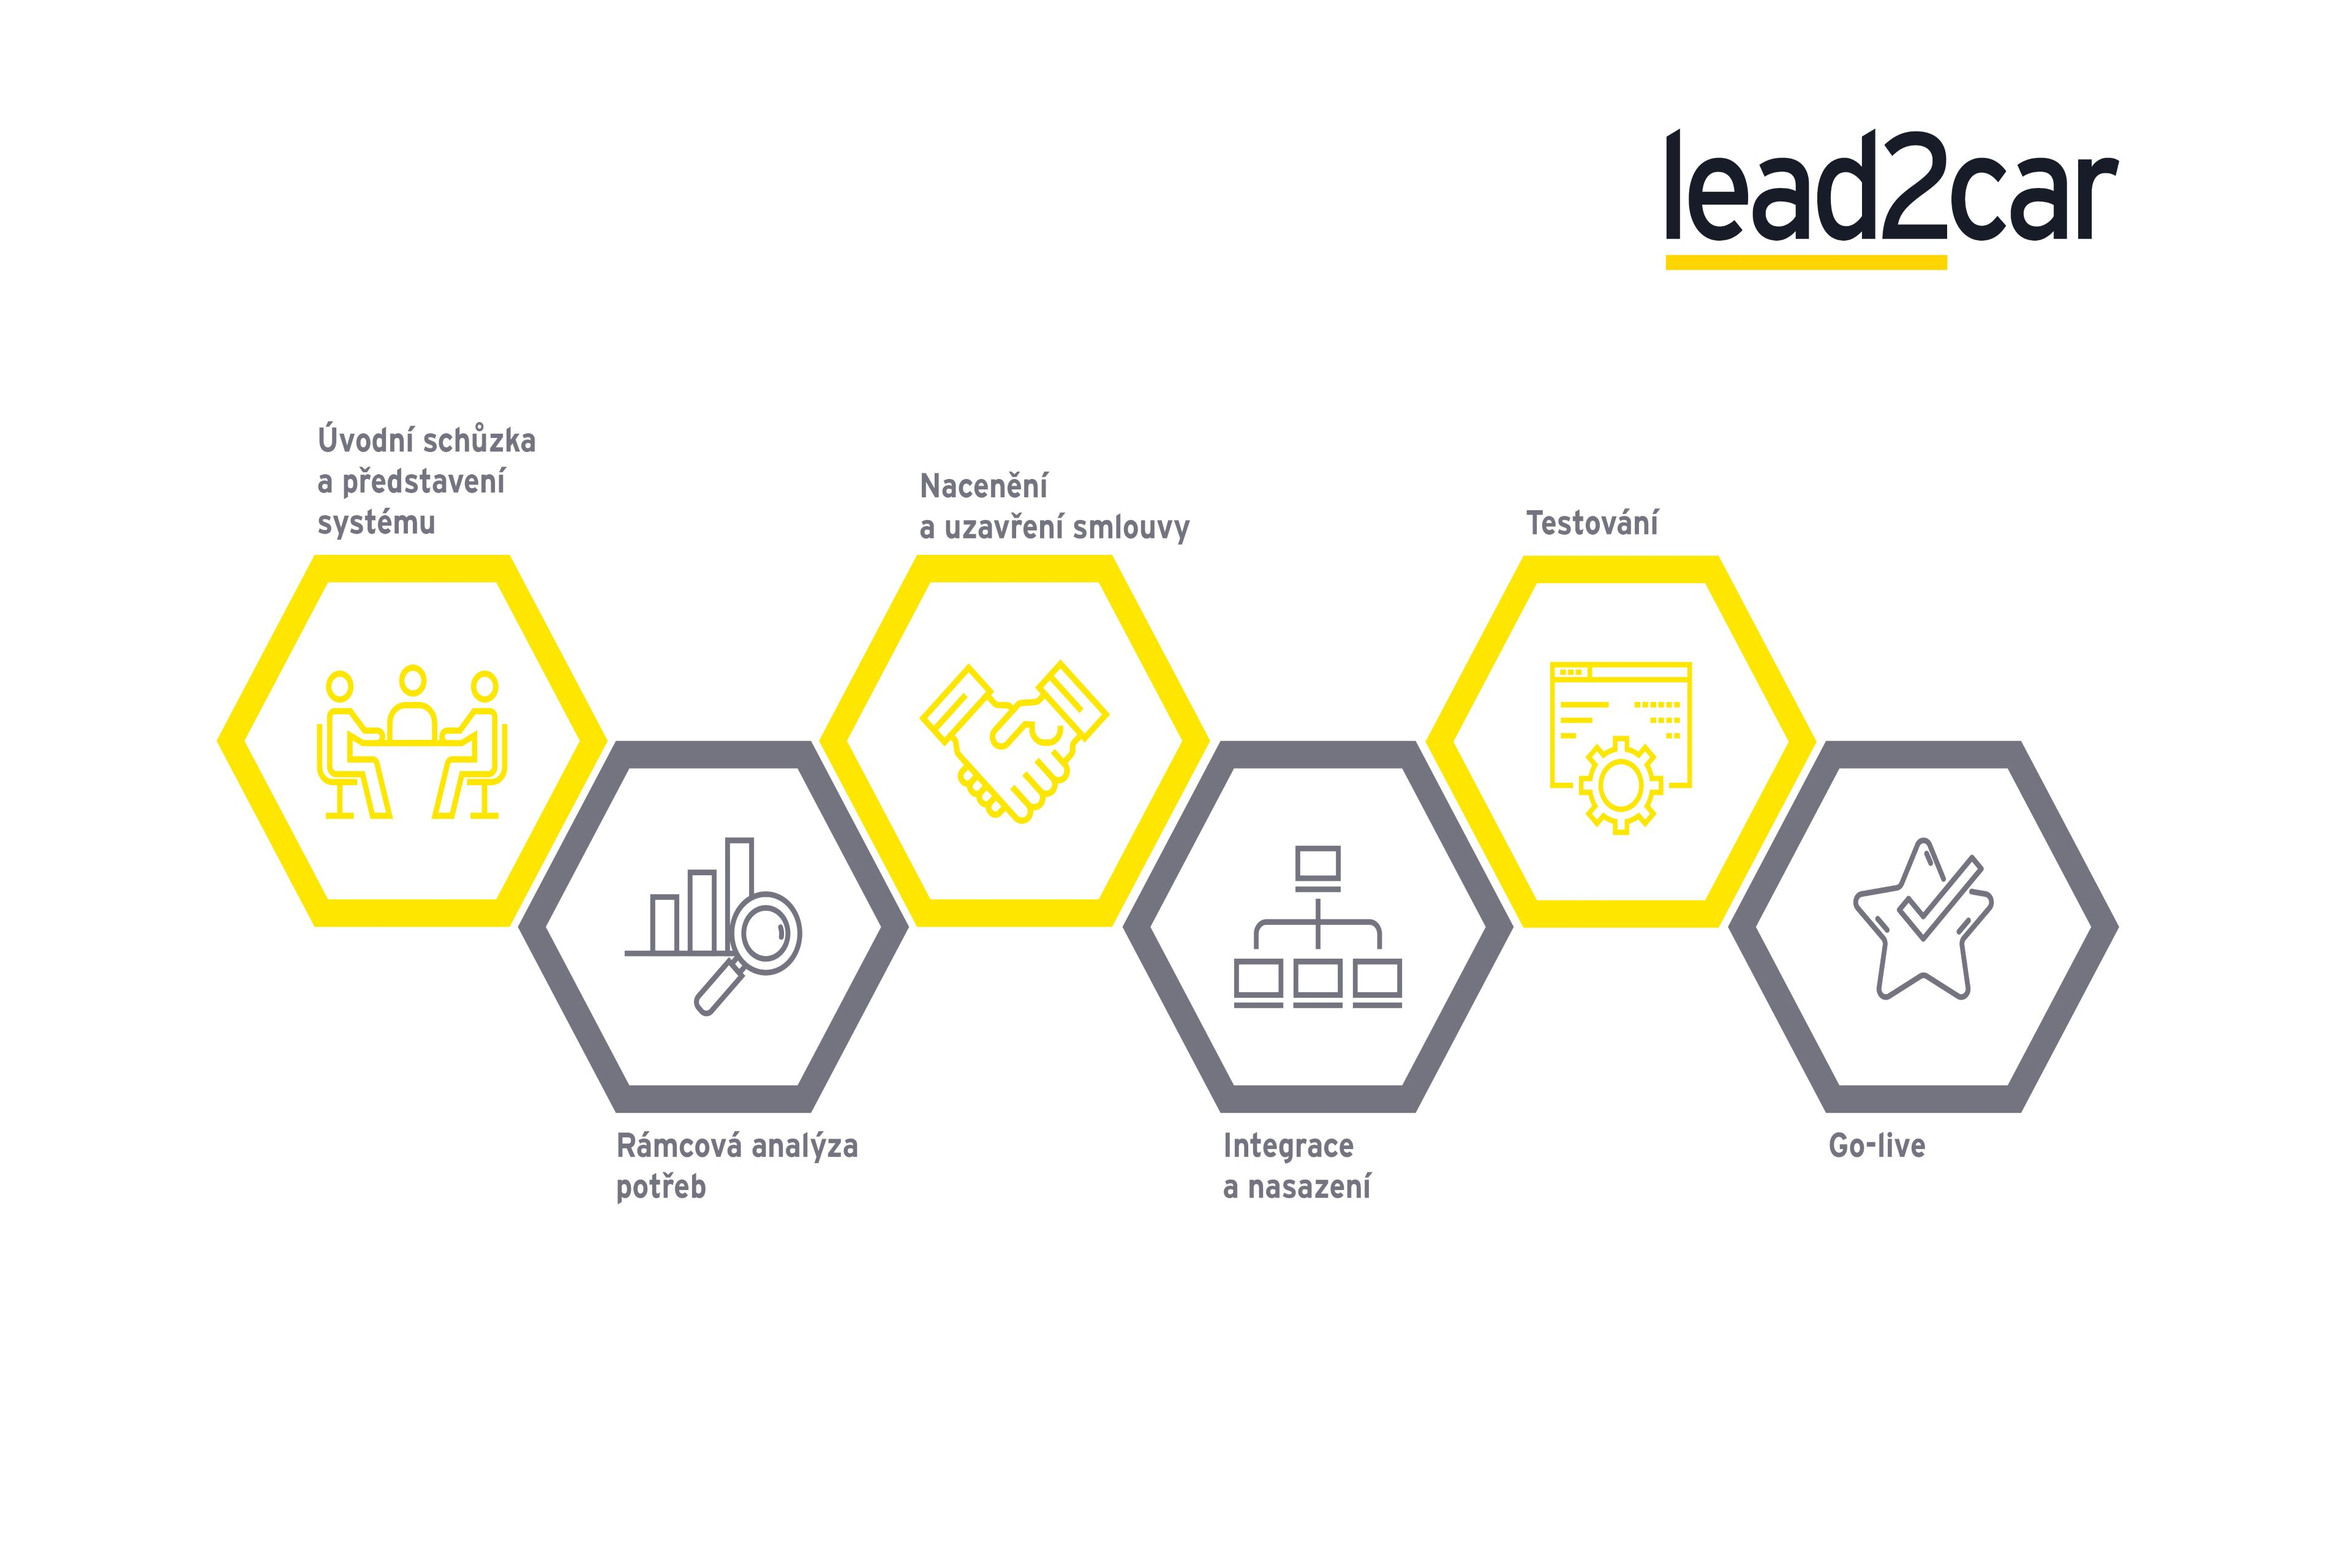 lead2car